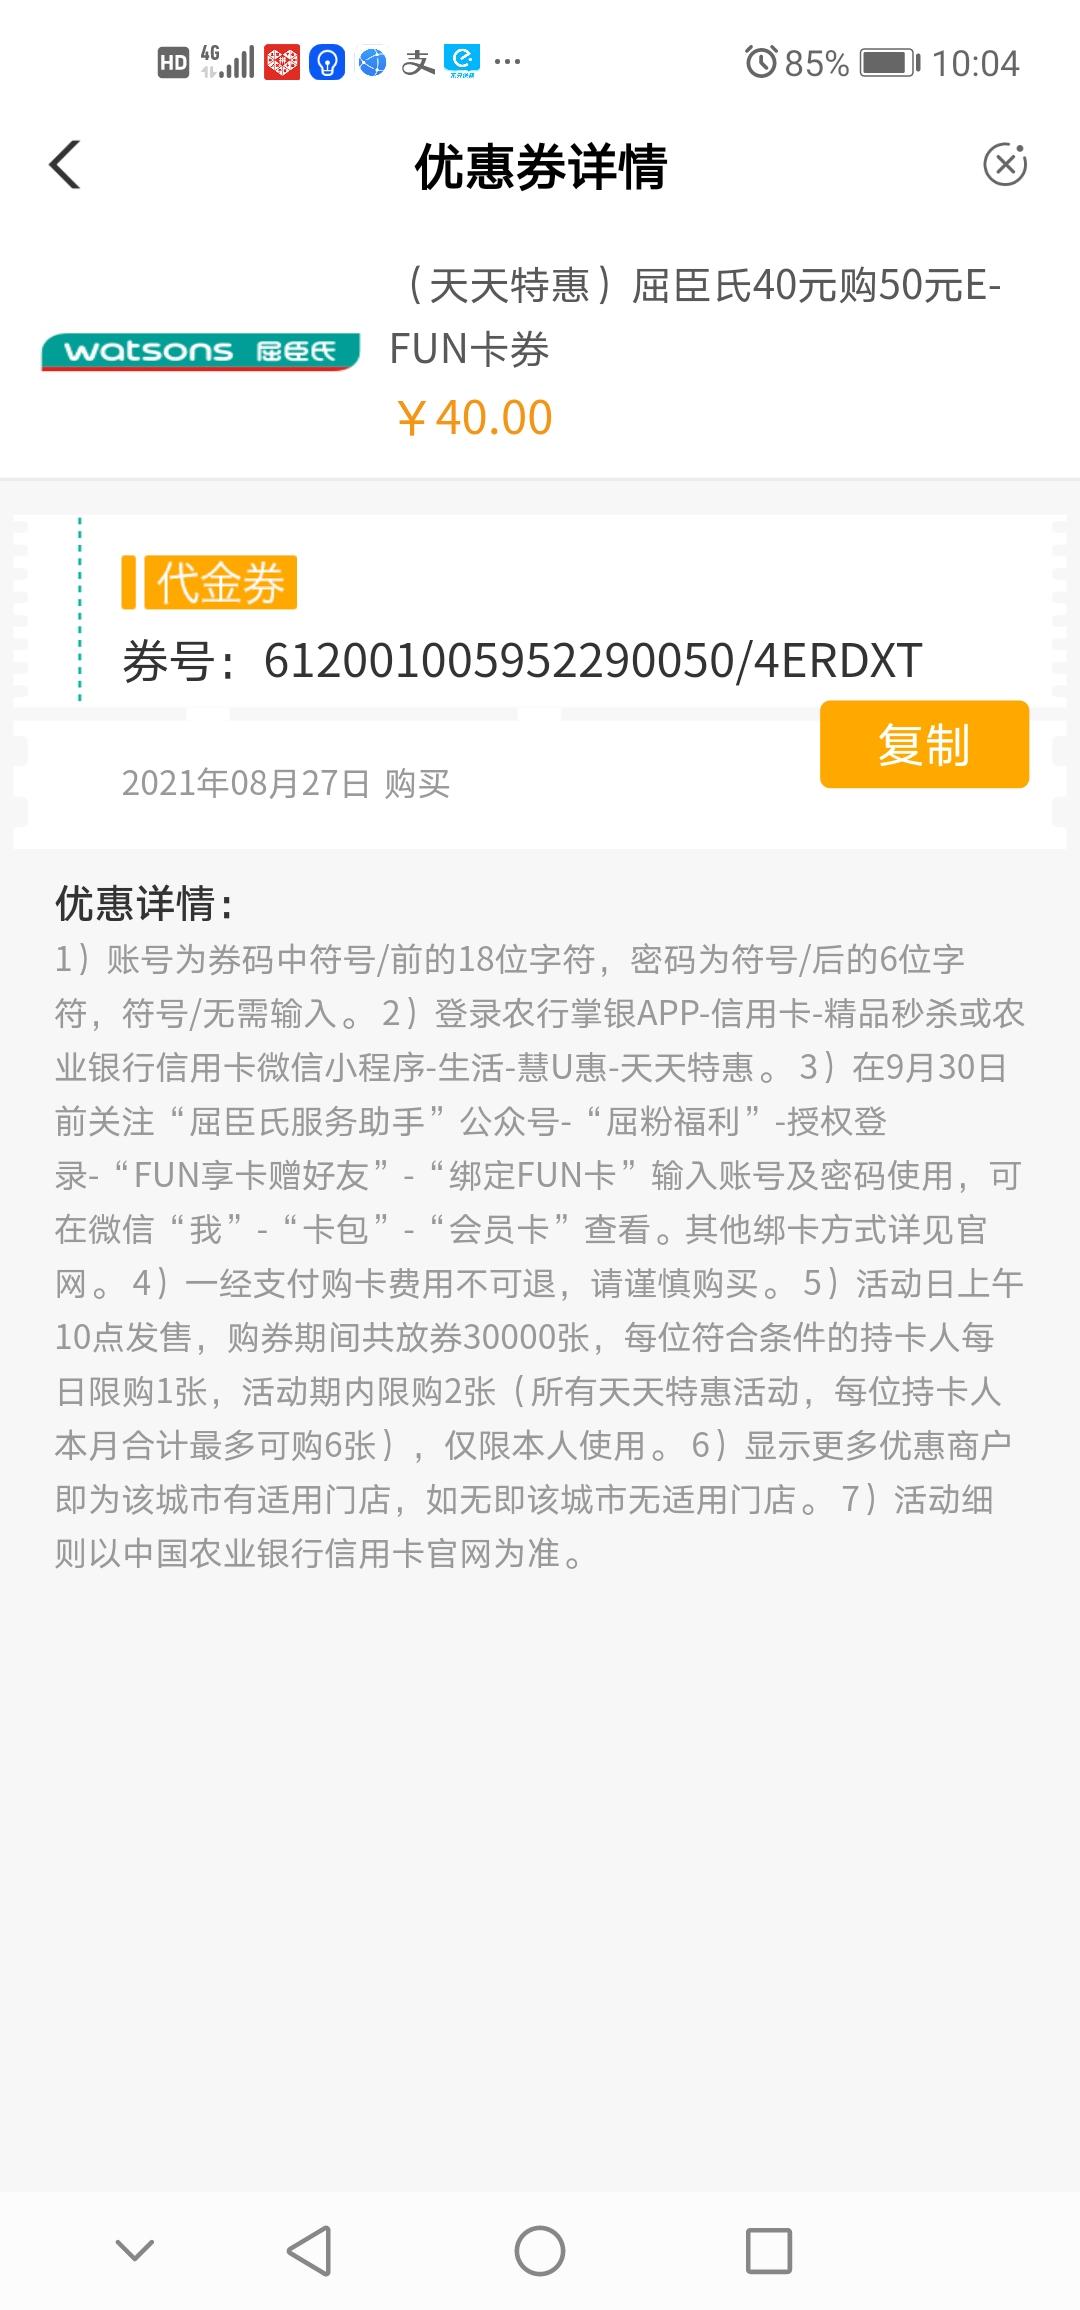 Screenshot_20210827_100413_com.android.bankabc.jpg